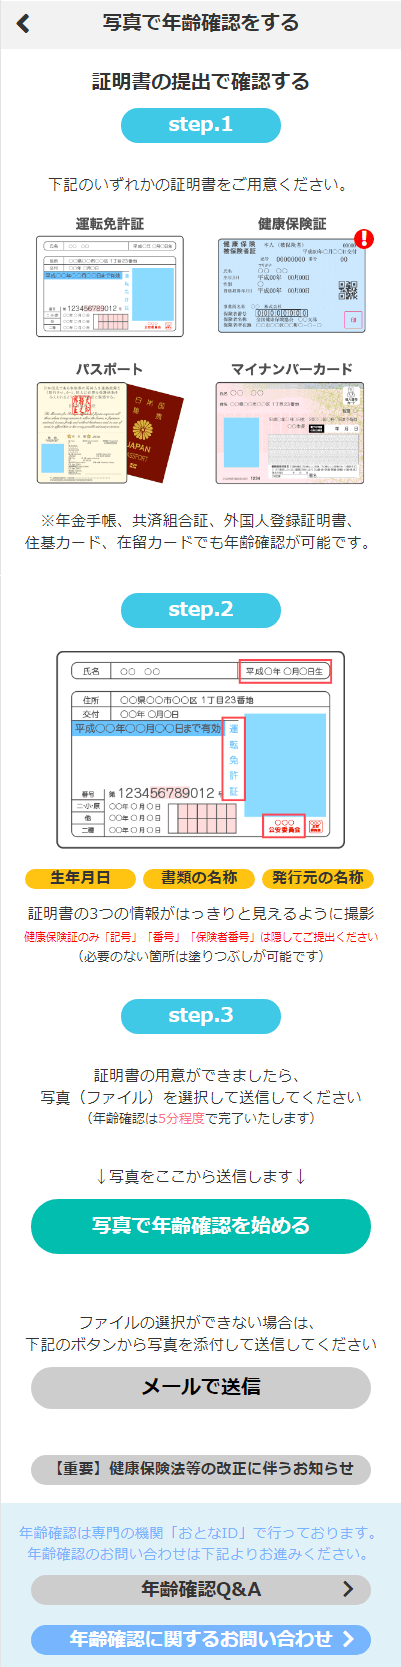 PCMAXの年齢確認の方法(スマホ・男性)